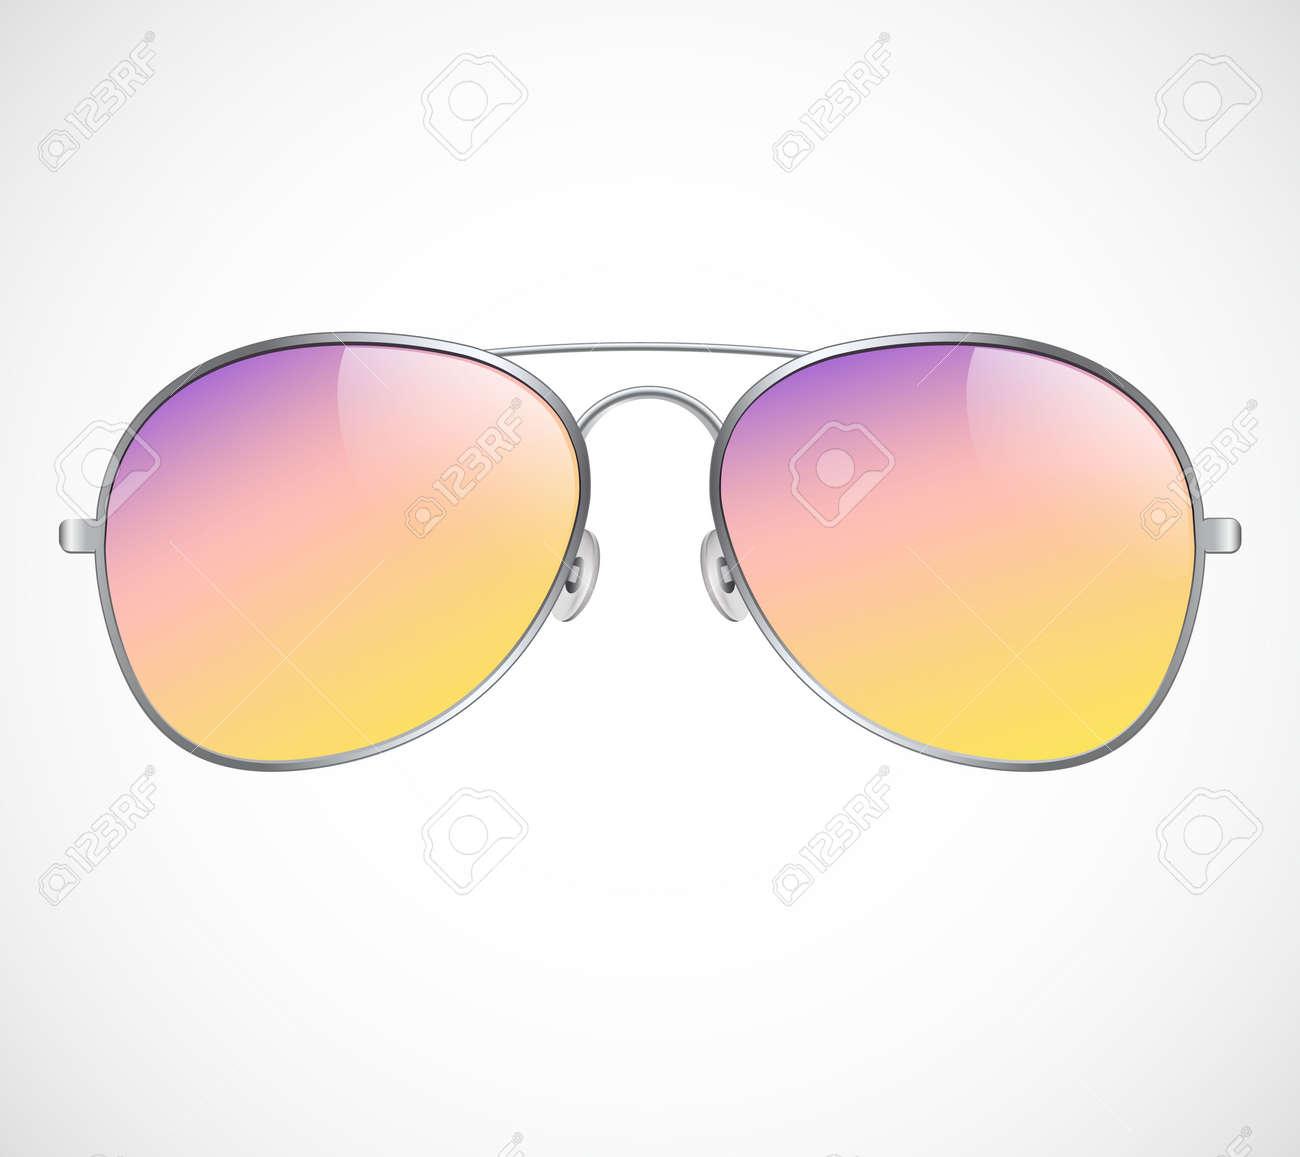 Aviator Sunglasses Illustration Background. Sunset. Police isolated sunglasses. - 173035242